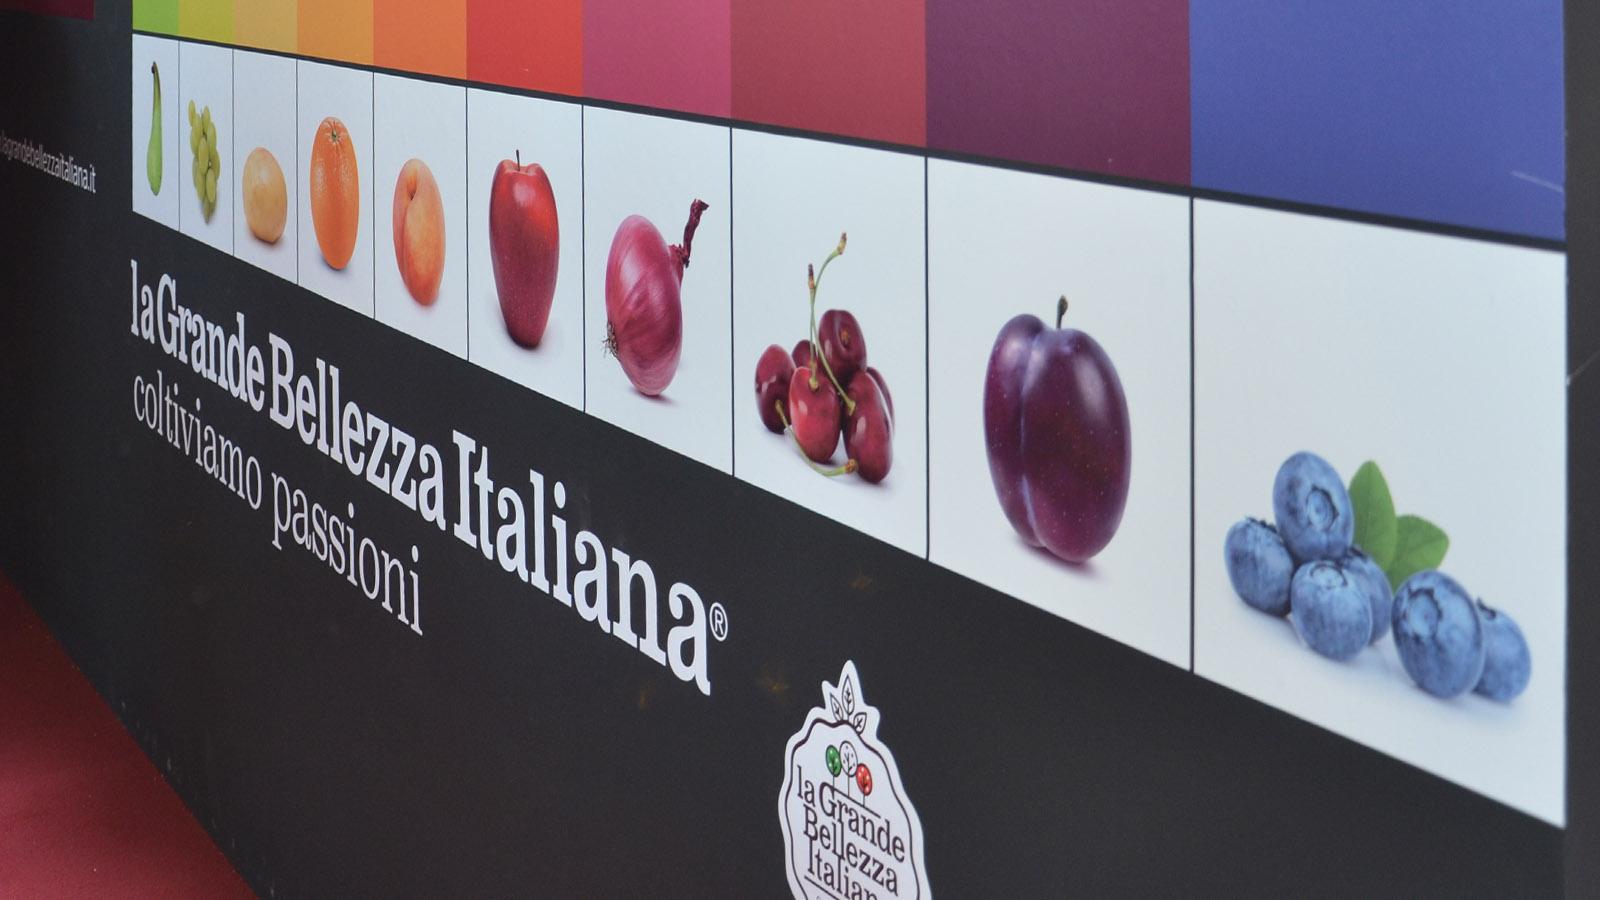 geofur-macfrut-2019-la-grande-bellezza-italiana